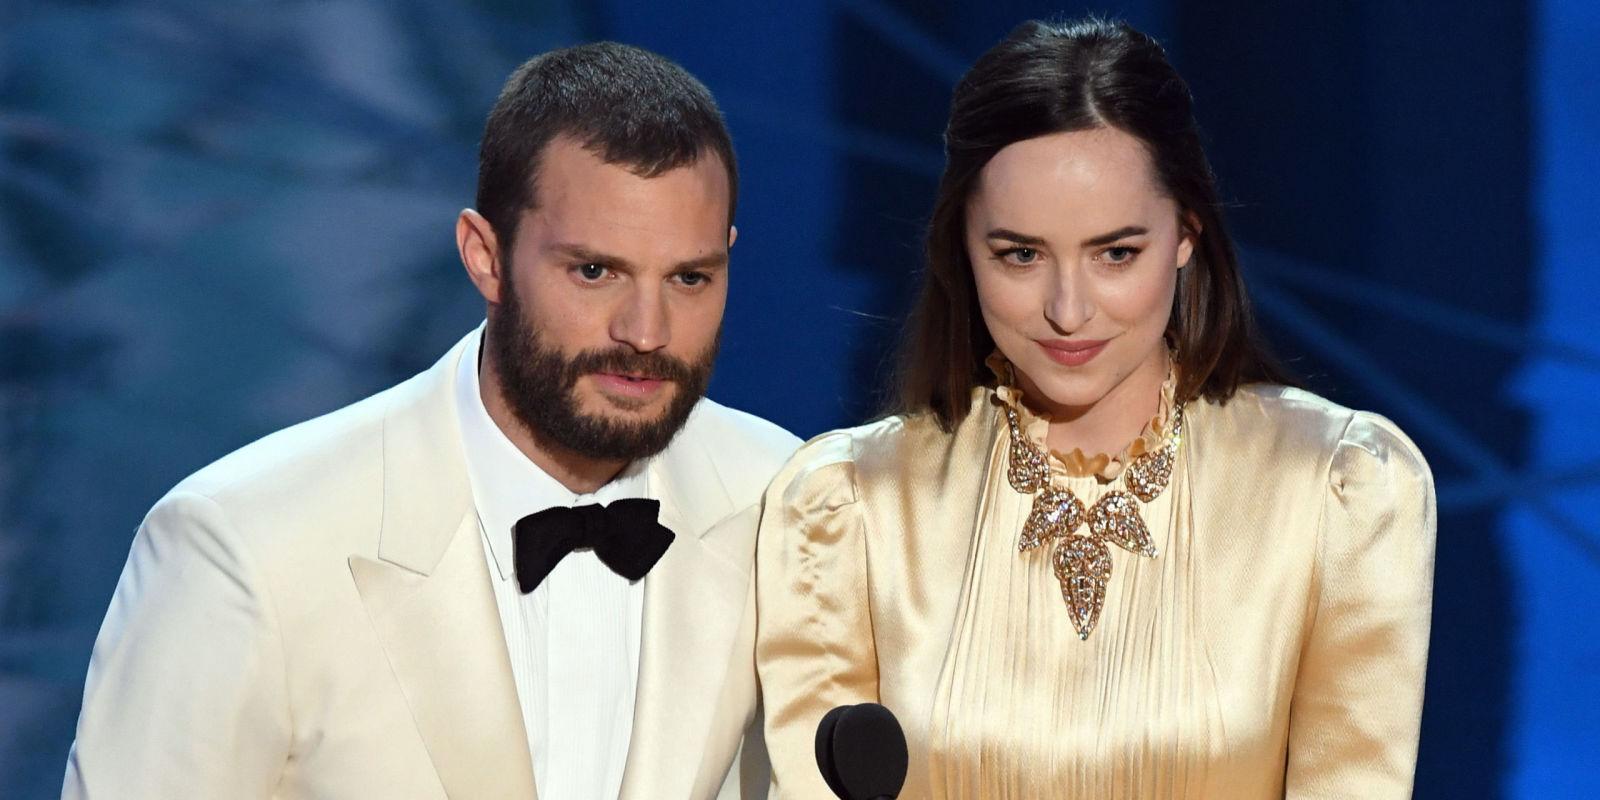 Dakota Johnson and Jamie Dornan's Awkwardness Reached a Climax at the Oscars